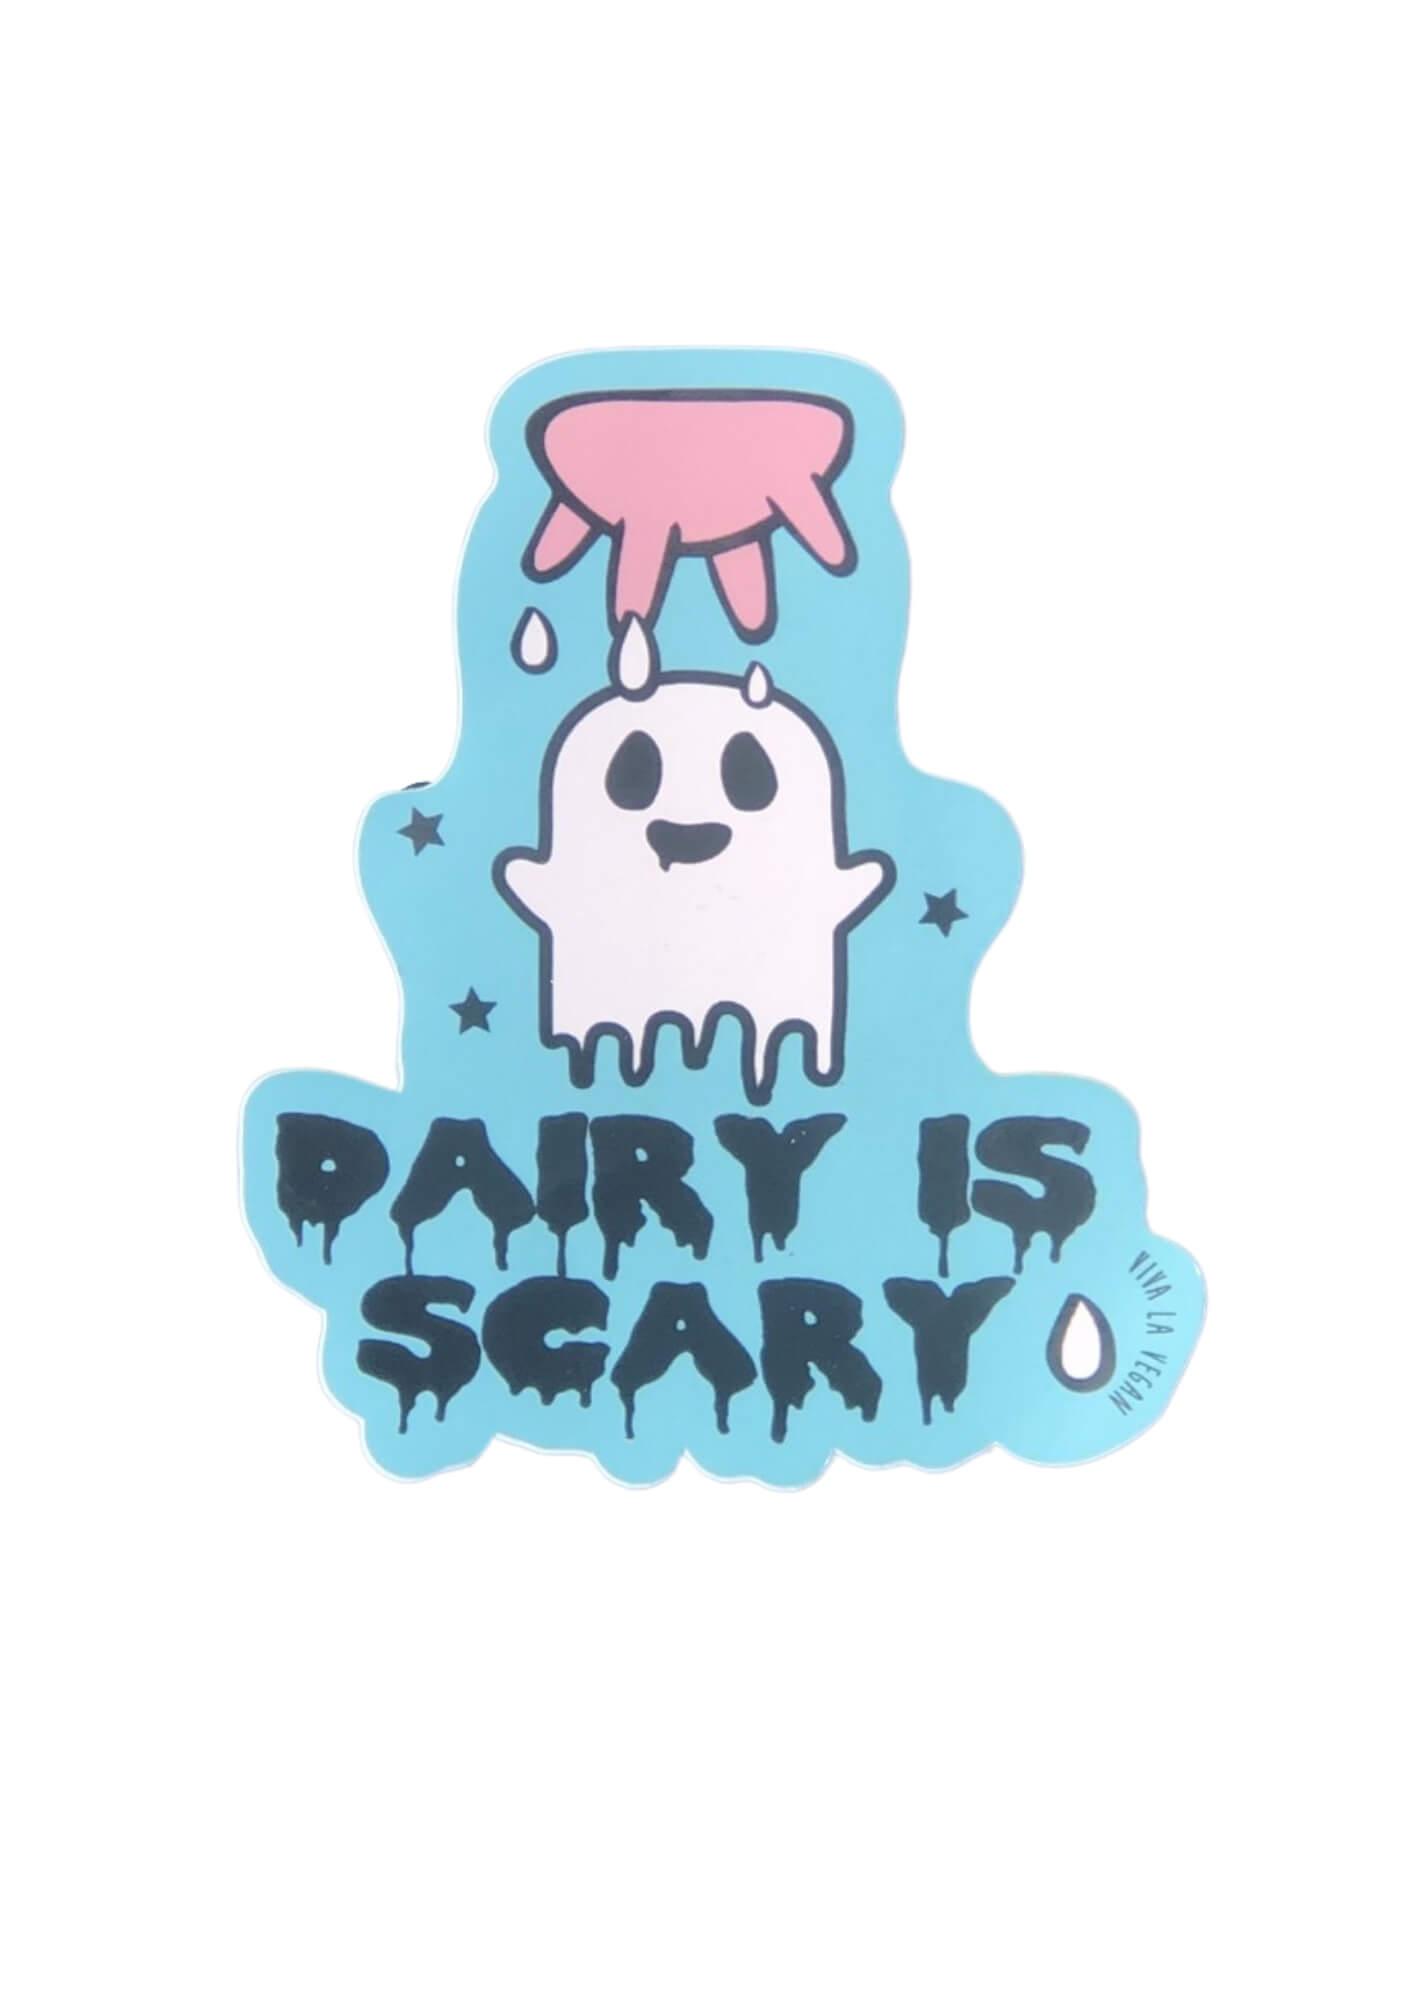 Vinyl Vegan Sticker - Dairy Is Scary by eco ethical brand Viva La Vegan